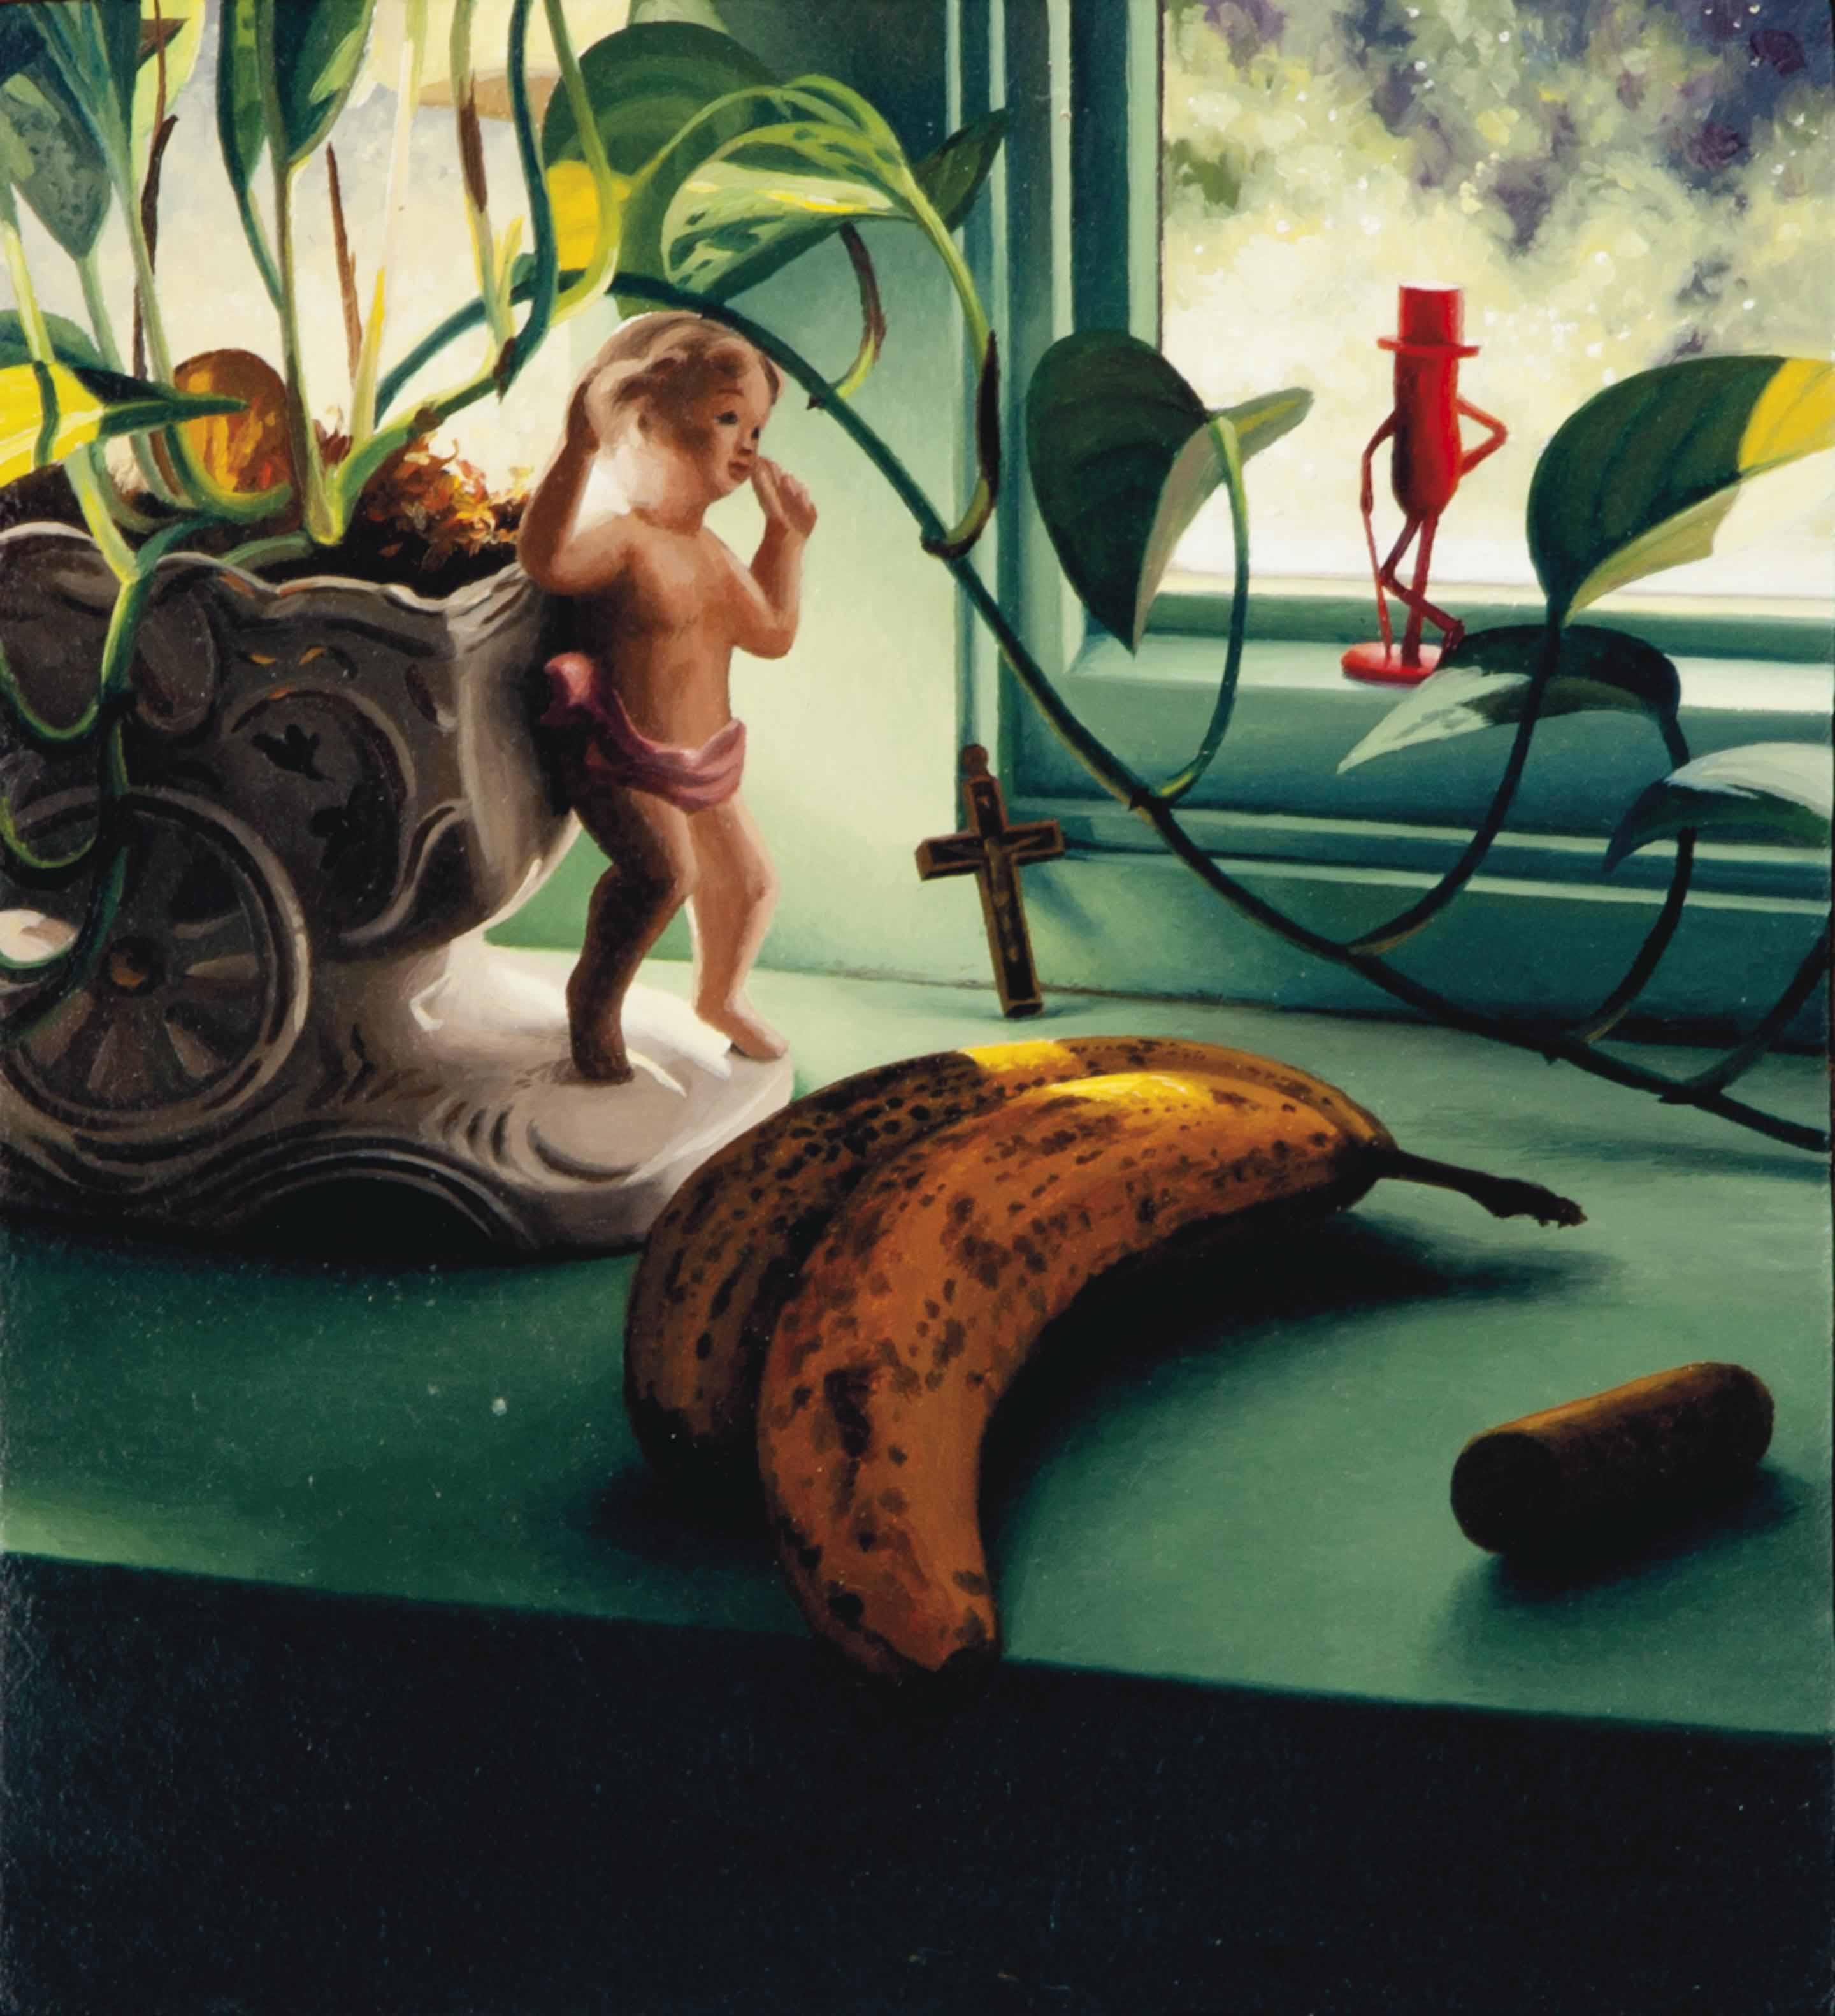 Still life with cherubic figure, bananas, wine cork and Mr. Peanut figurine